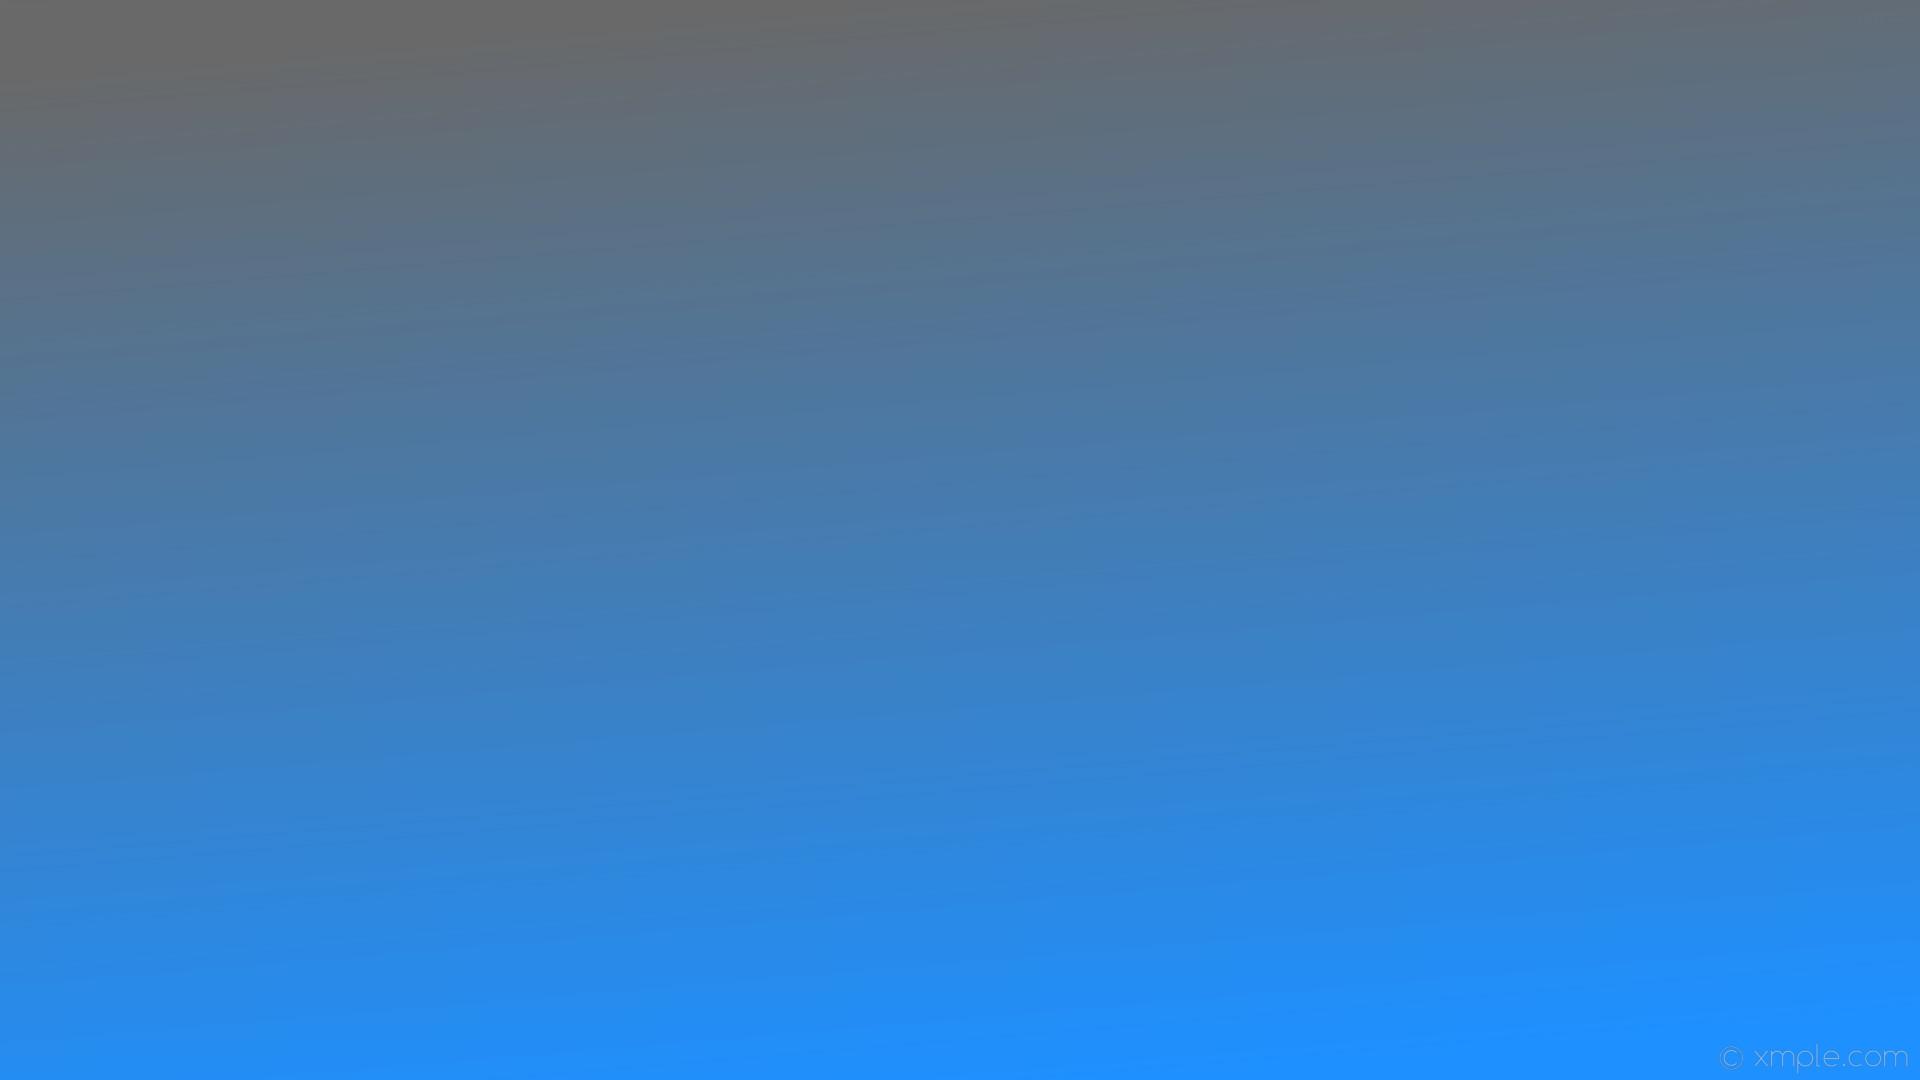 wallpaper blue grey gradient linear dodger blue dim gray #1e90ff #696969  285°